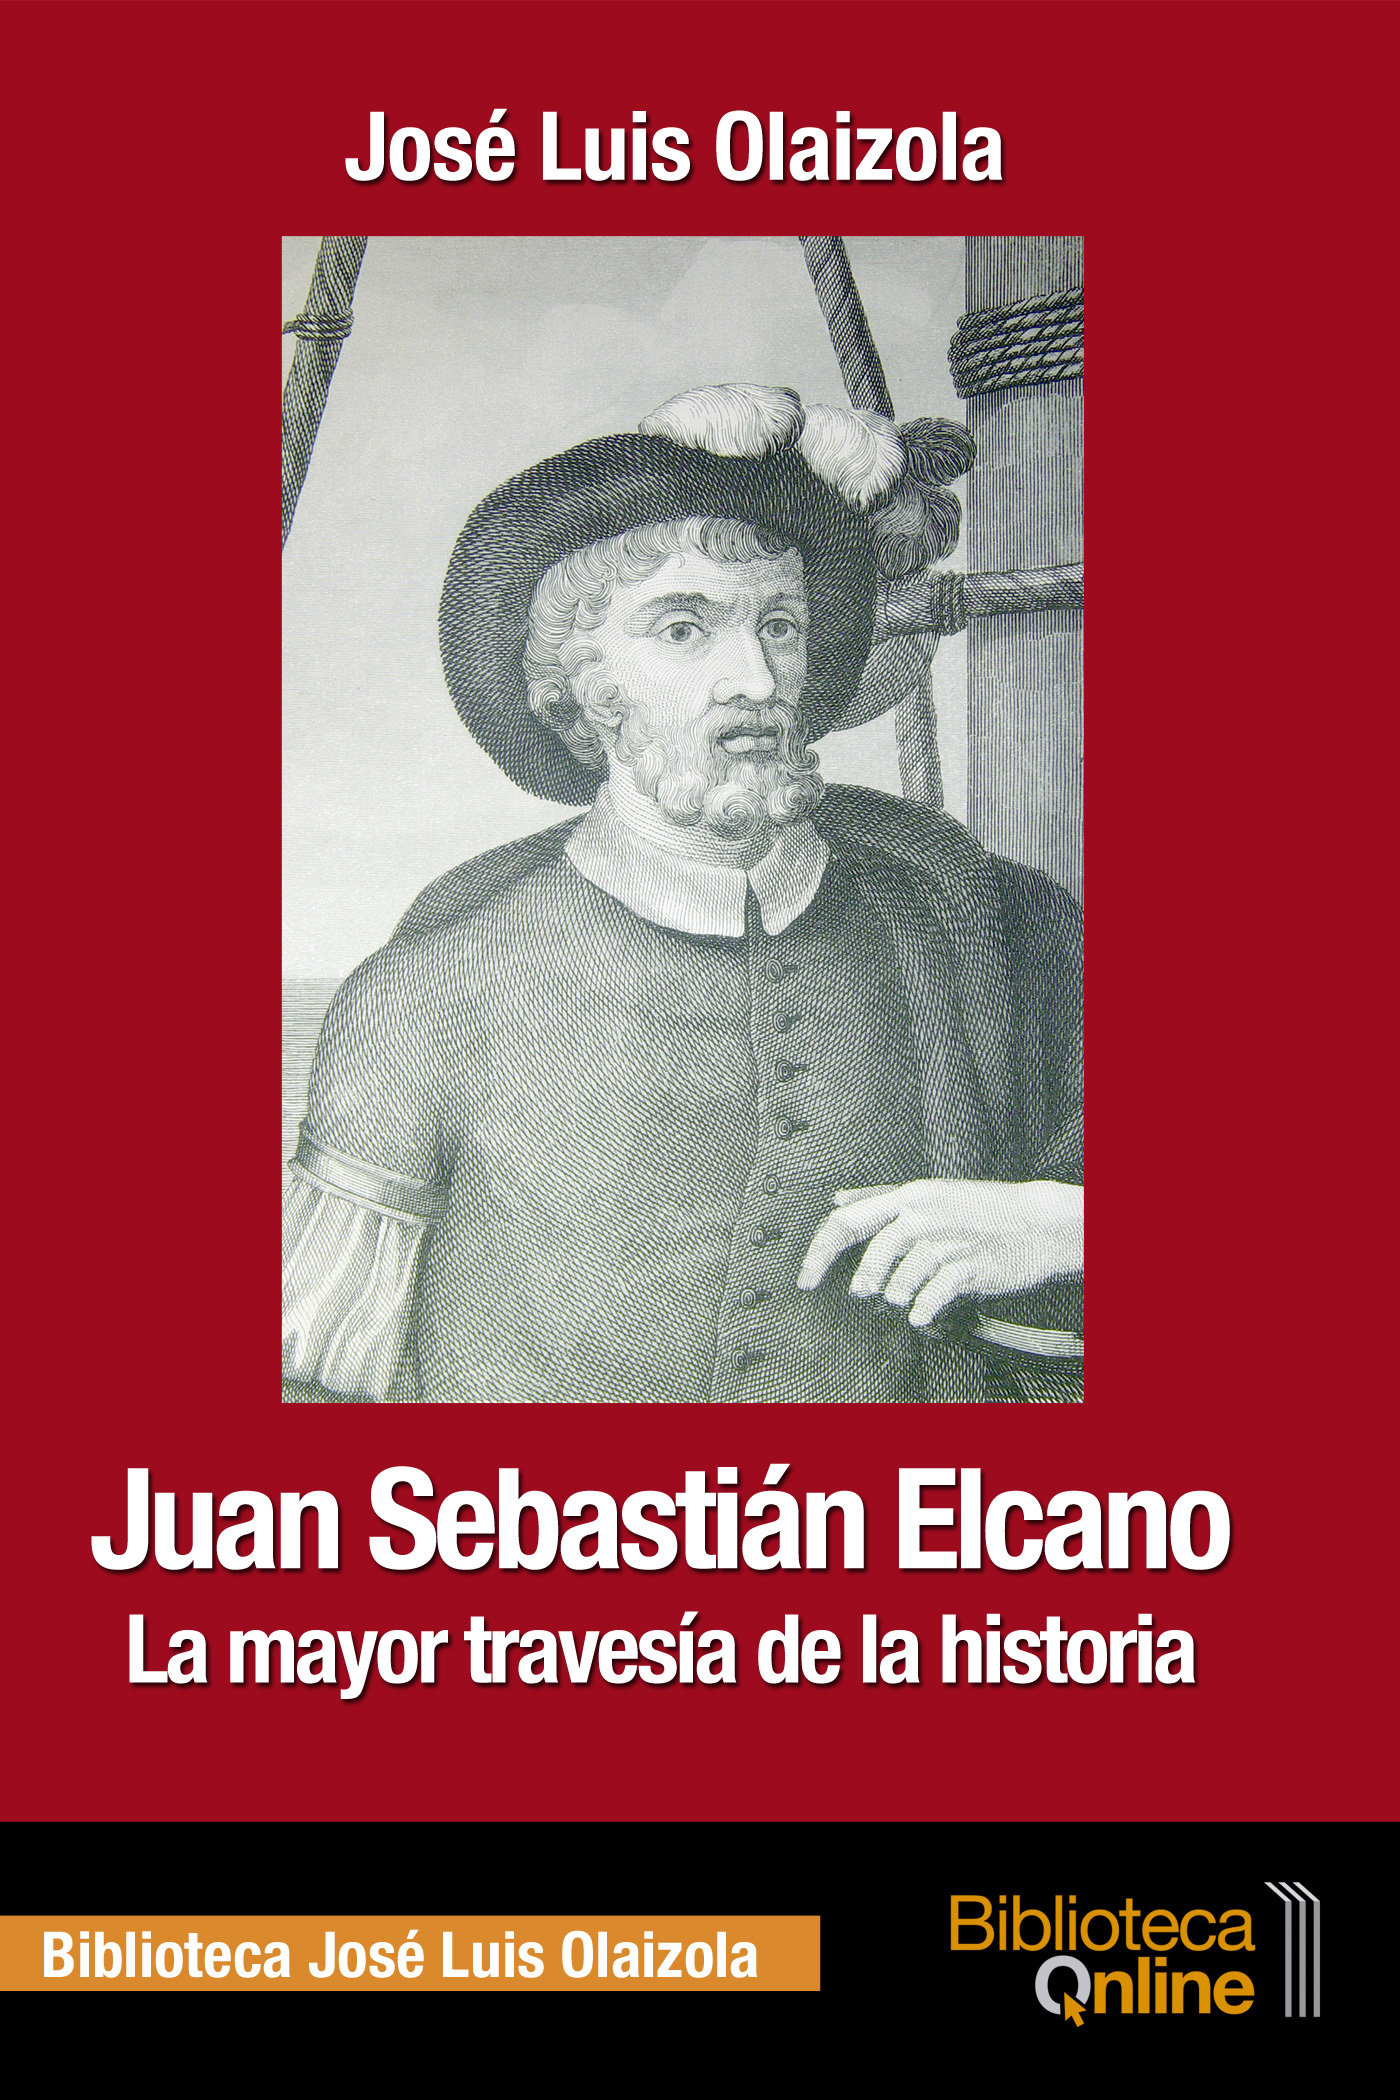 Juan Sebastián Elcano, la mayor travesía de la historia JSE-JLO